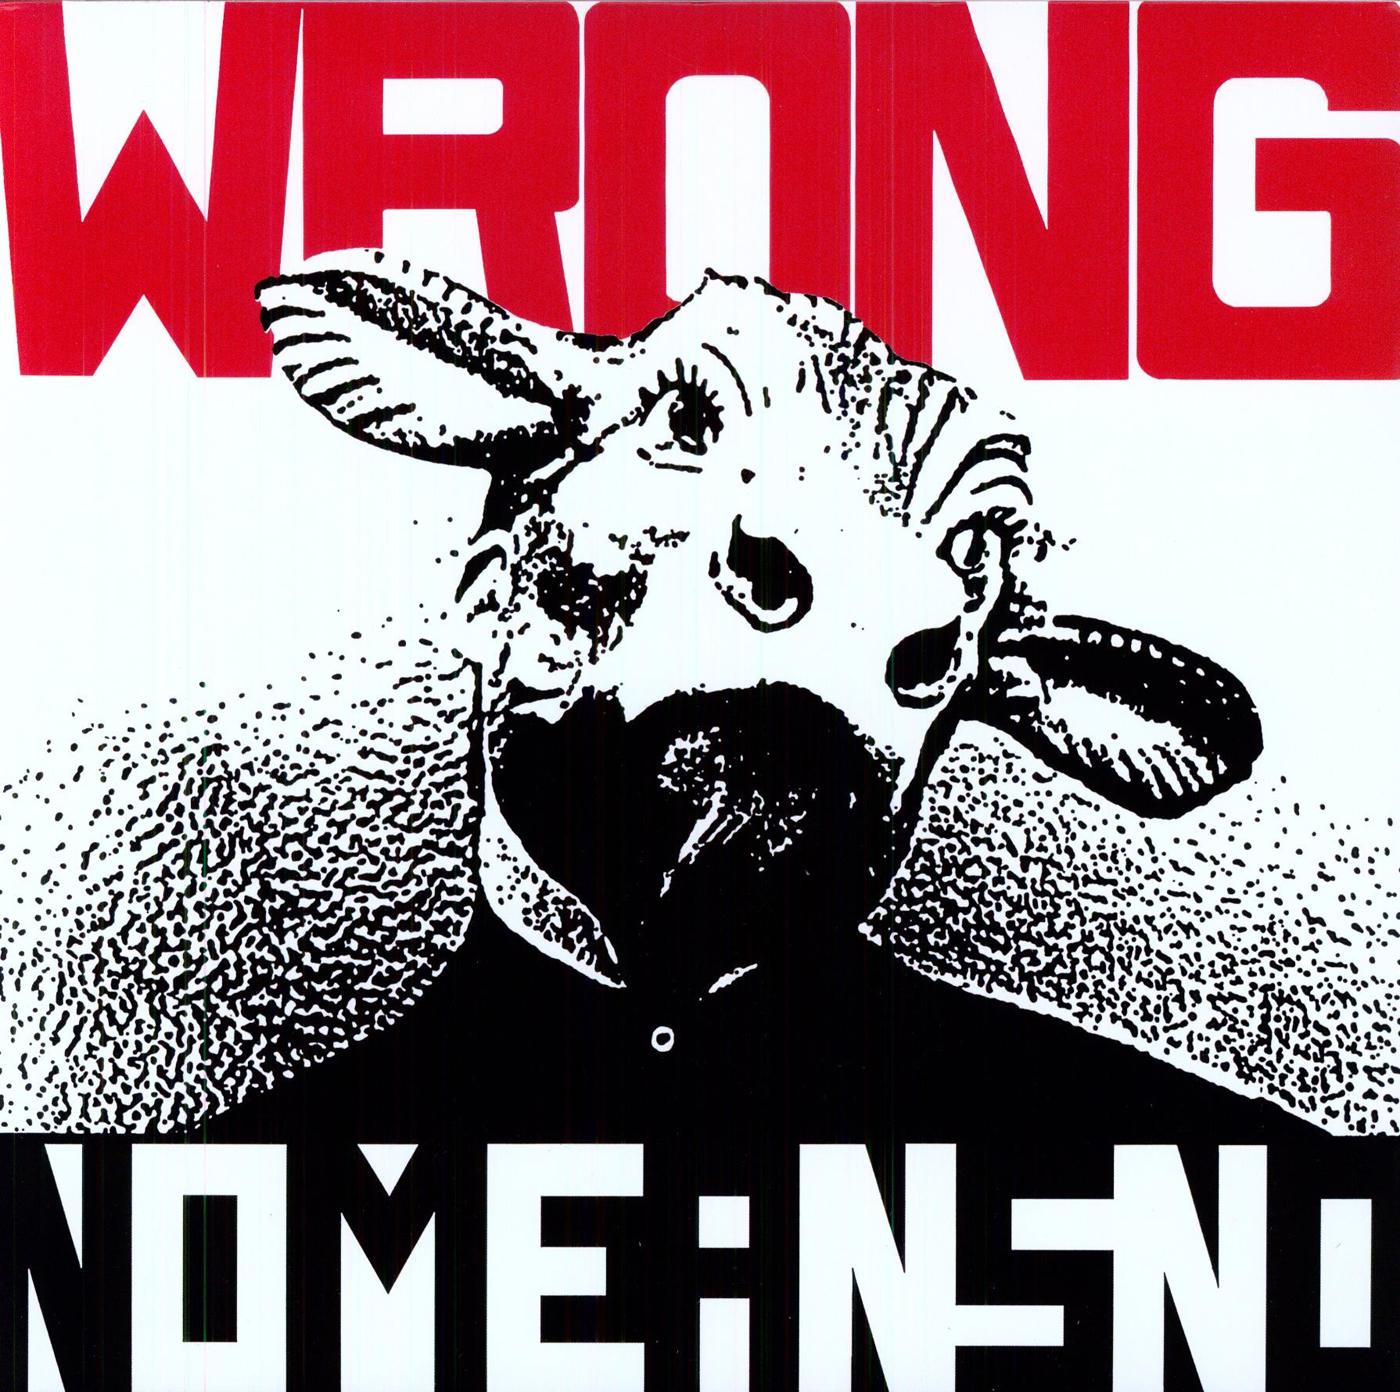 Nomeansno+-+Wrong.jpg